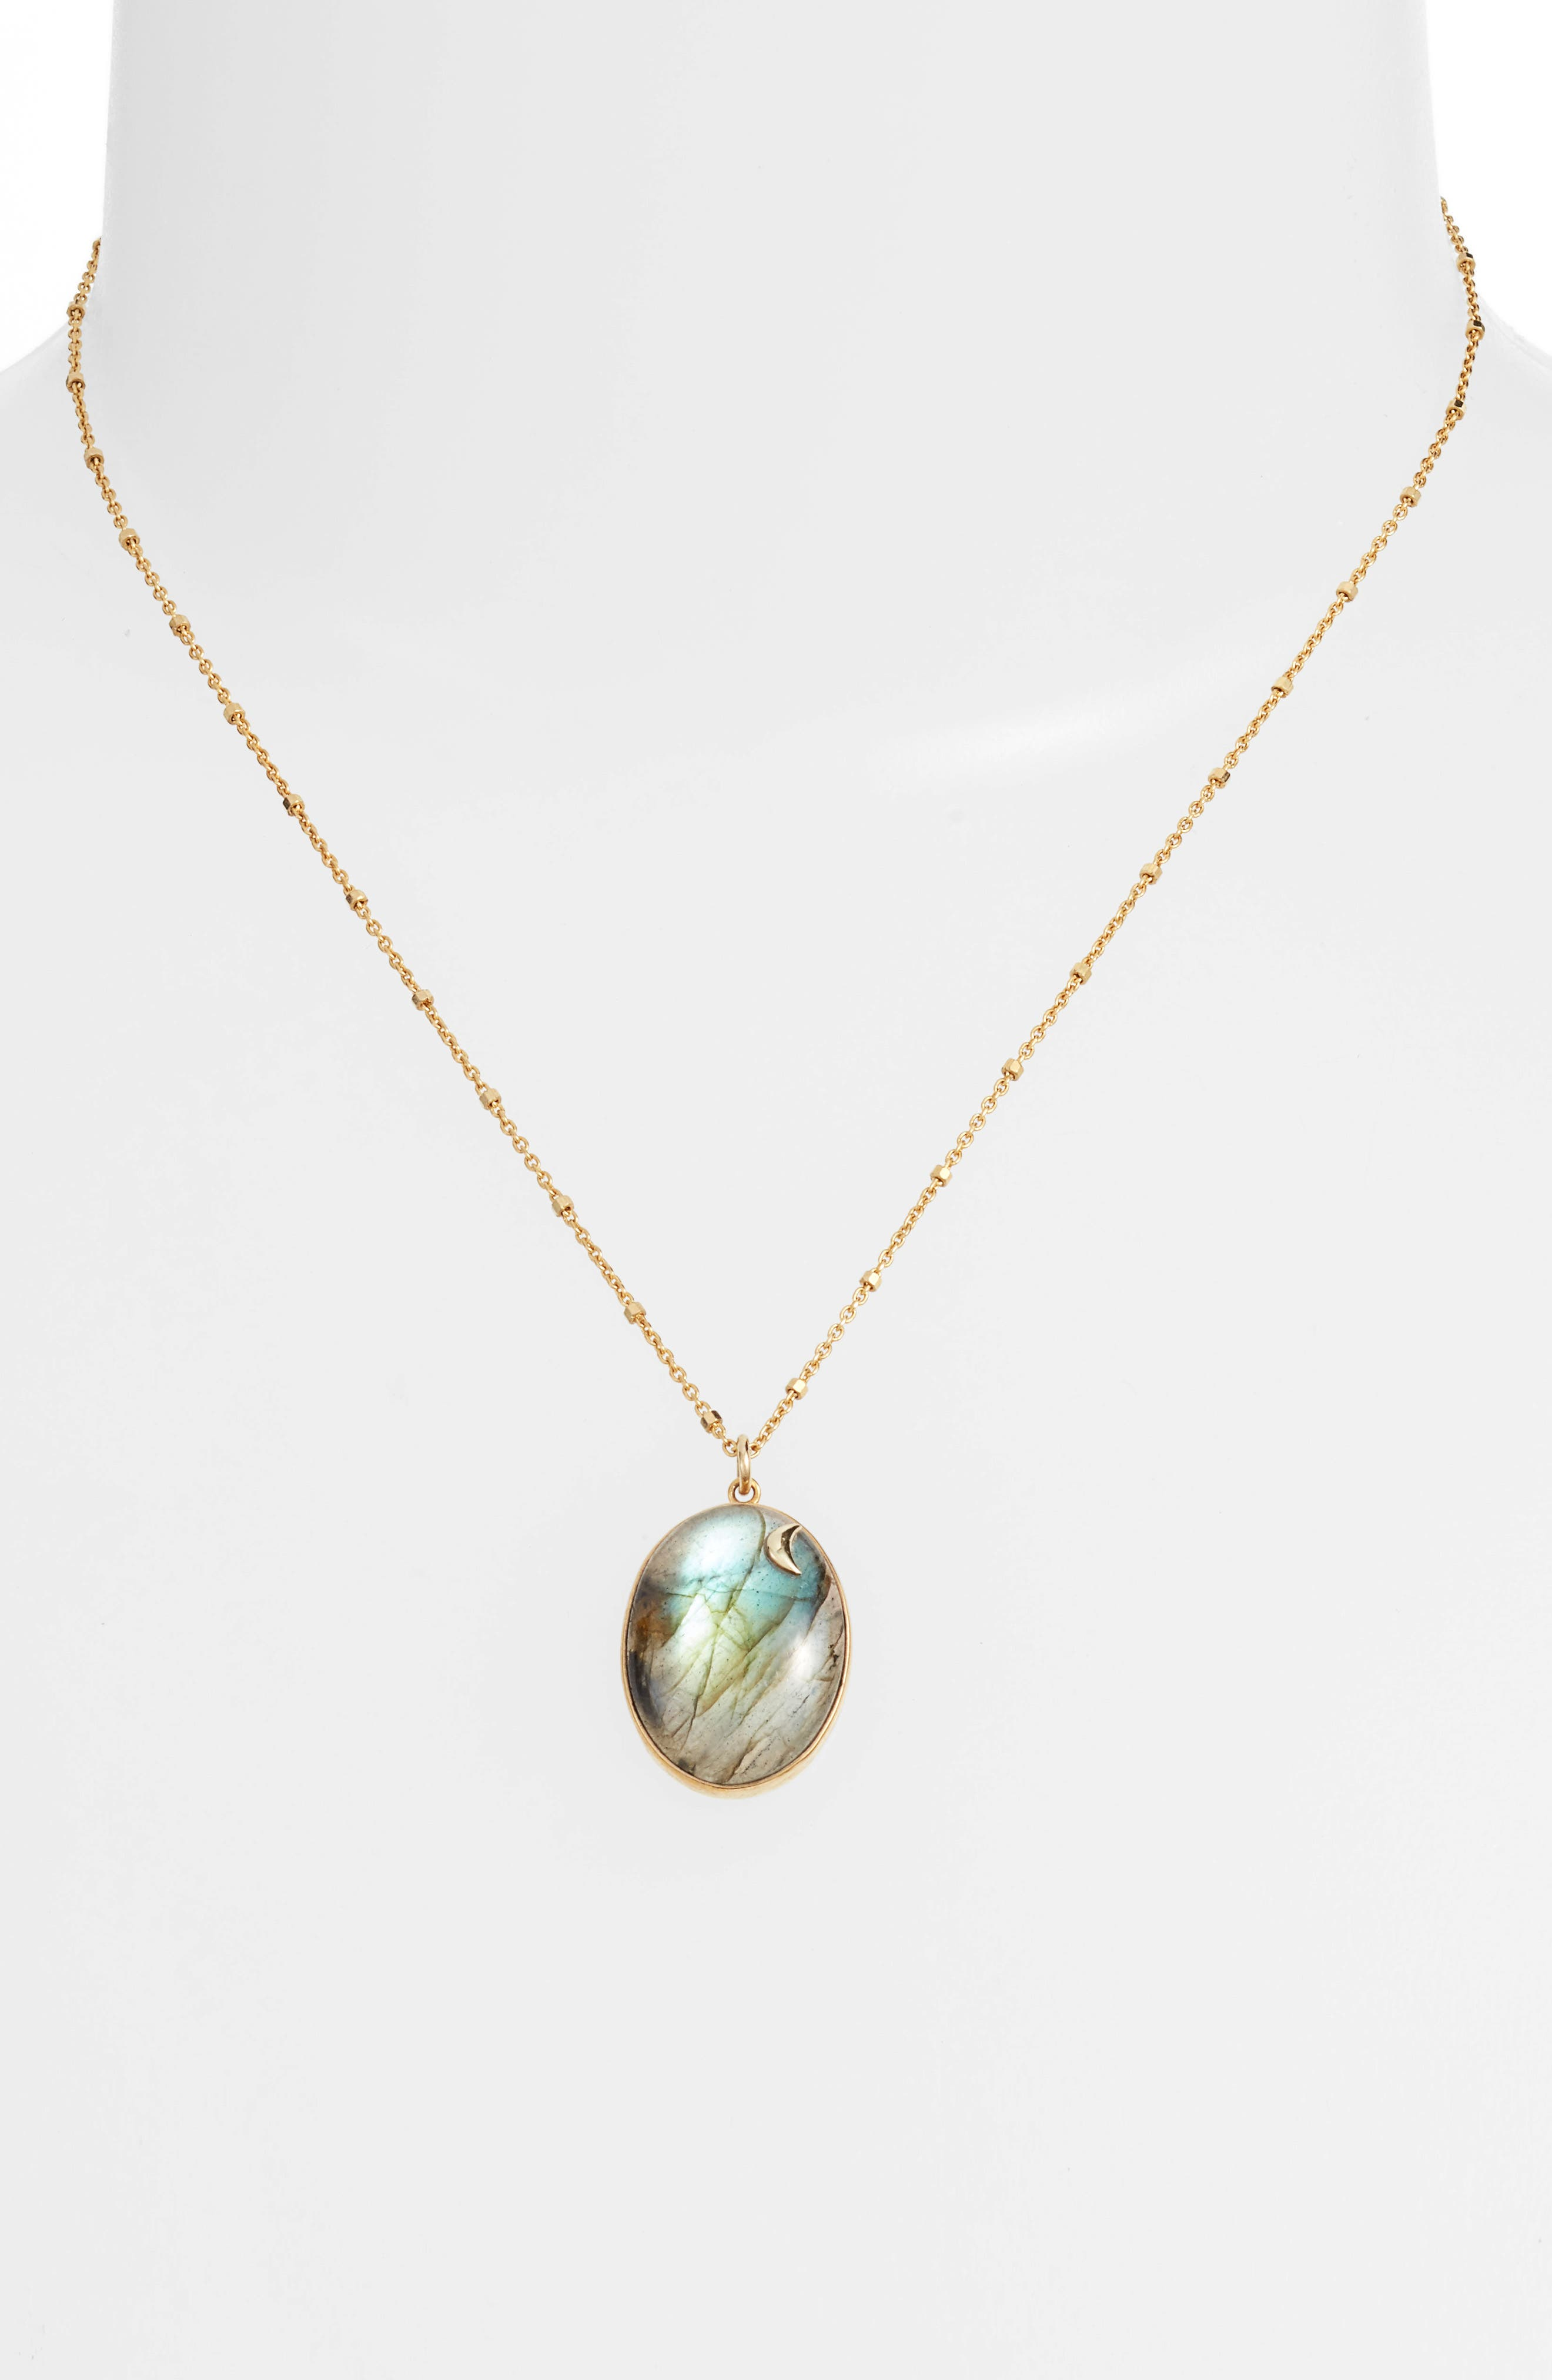 ARGENTO VIVO,                             Moon Labradorite Pendant Necklace,                             Alternate thumbnail 3, color,                             710